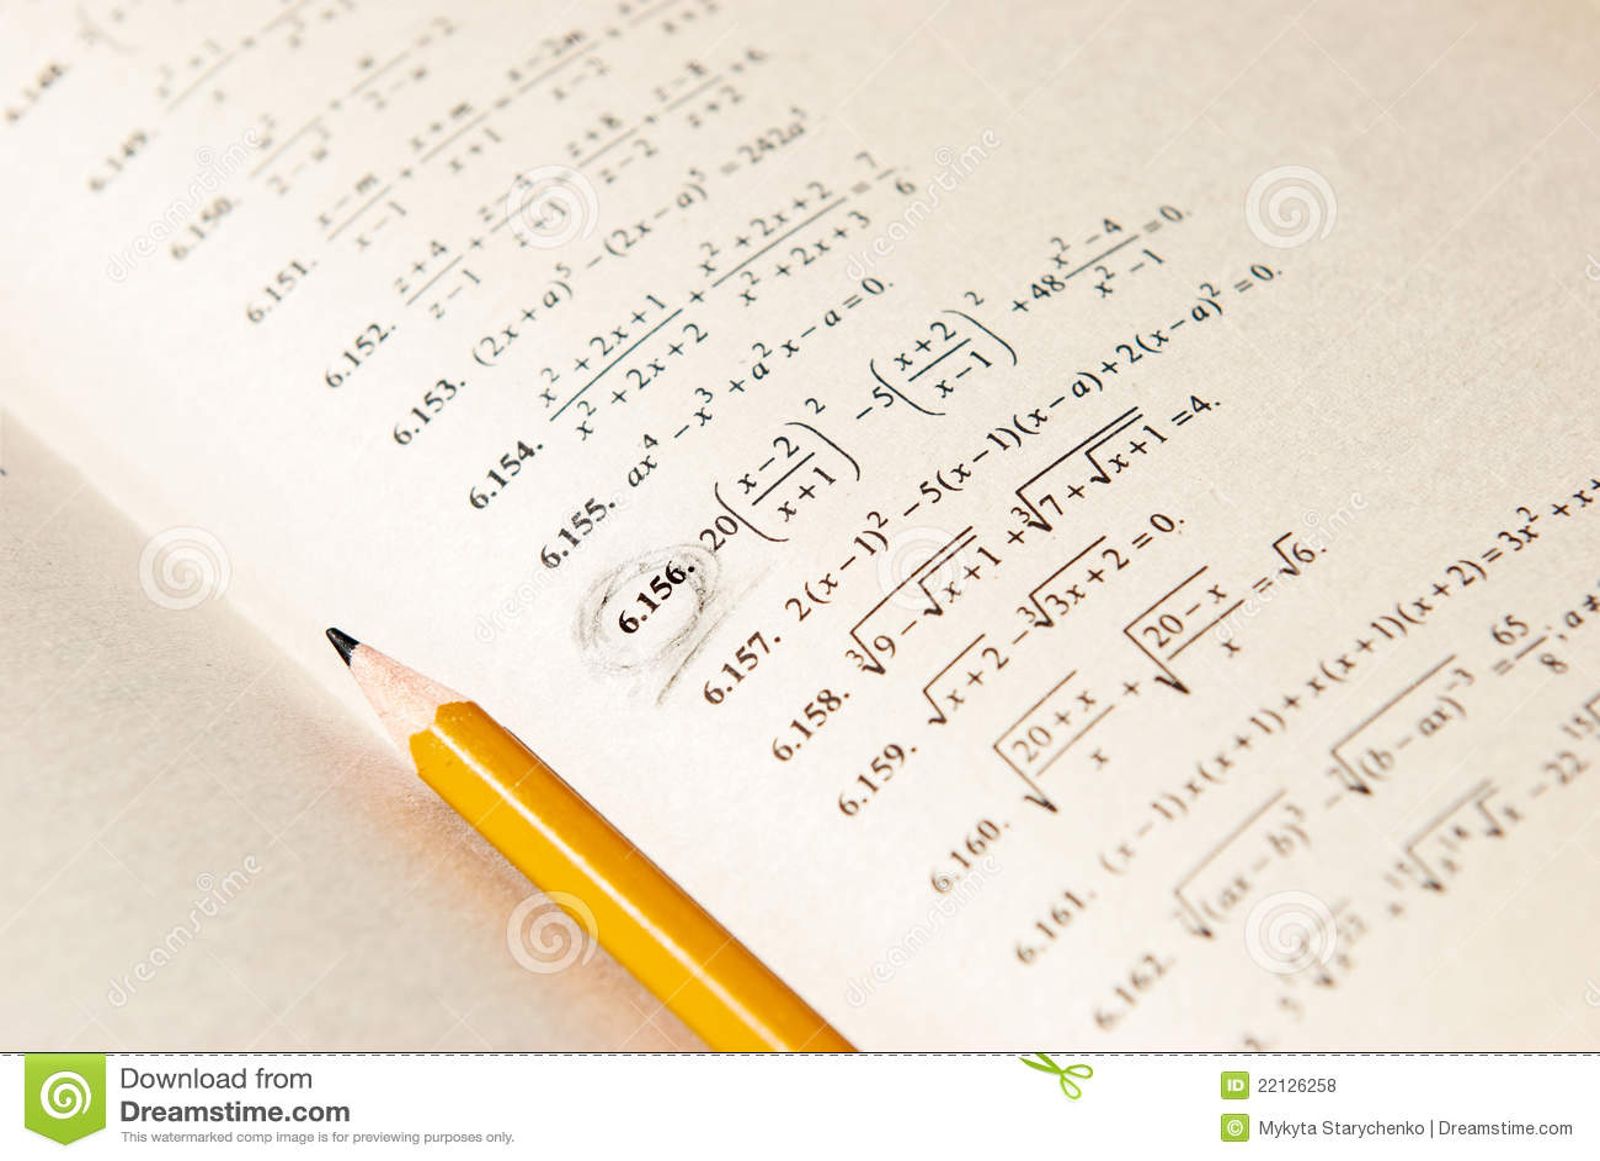 Mathematics Exercises In The Book Stock Photo - Image of symbols ...